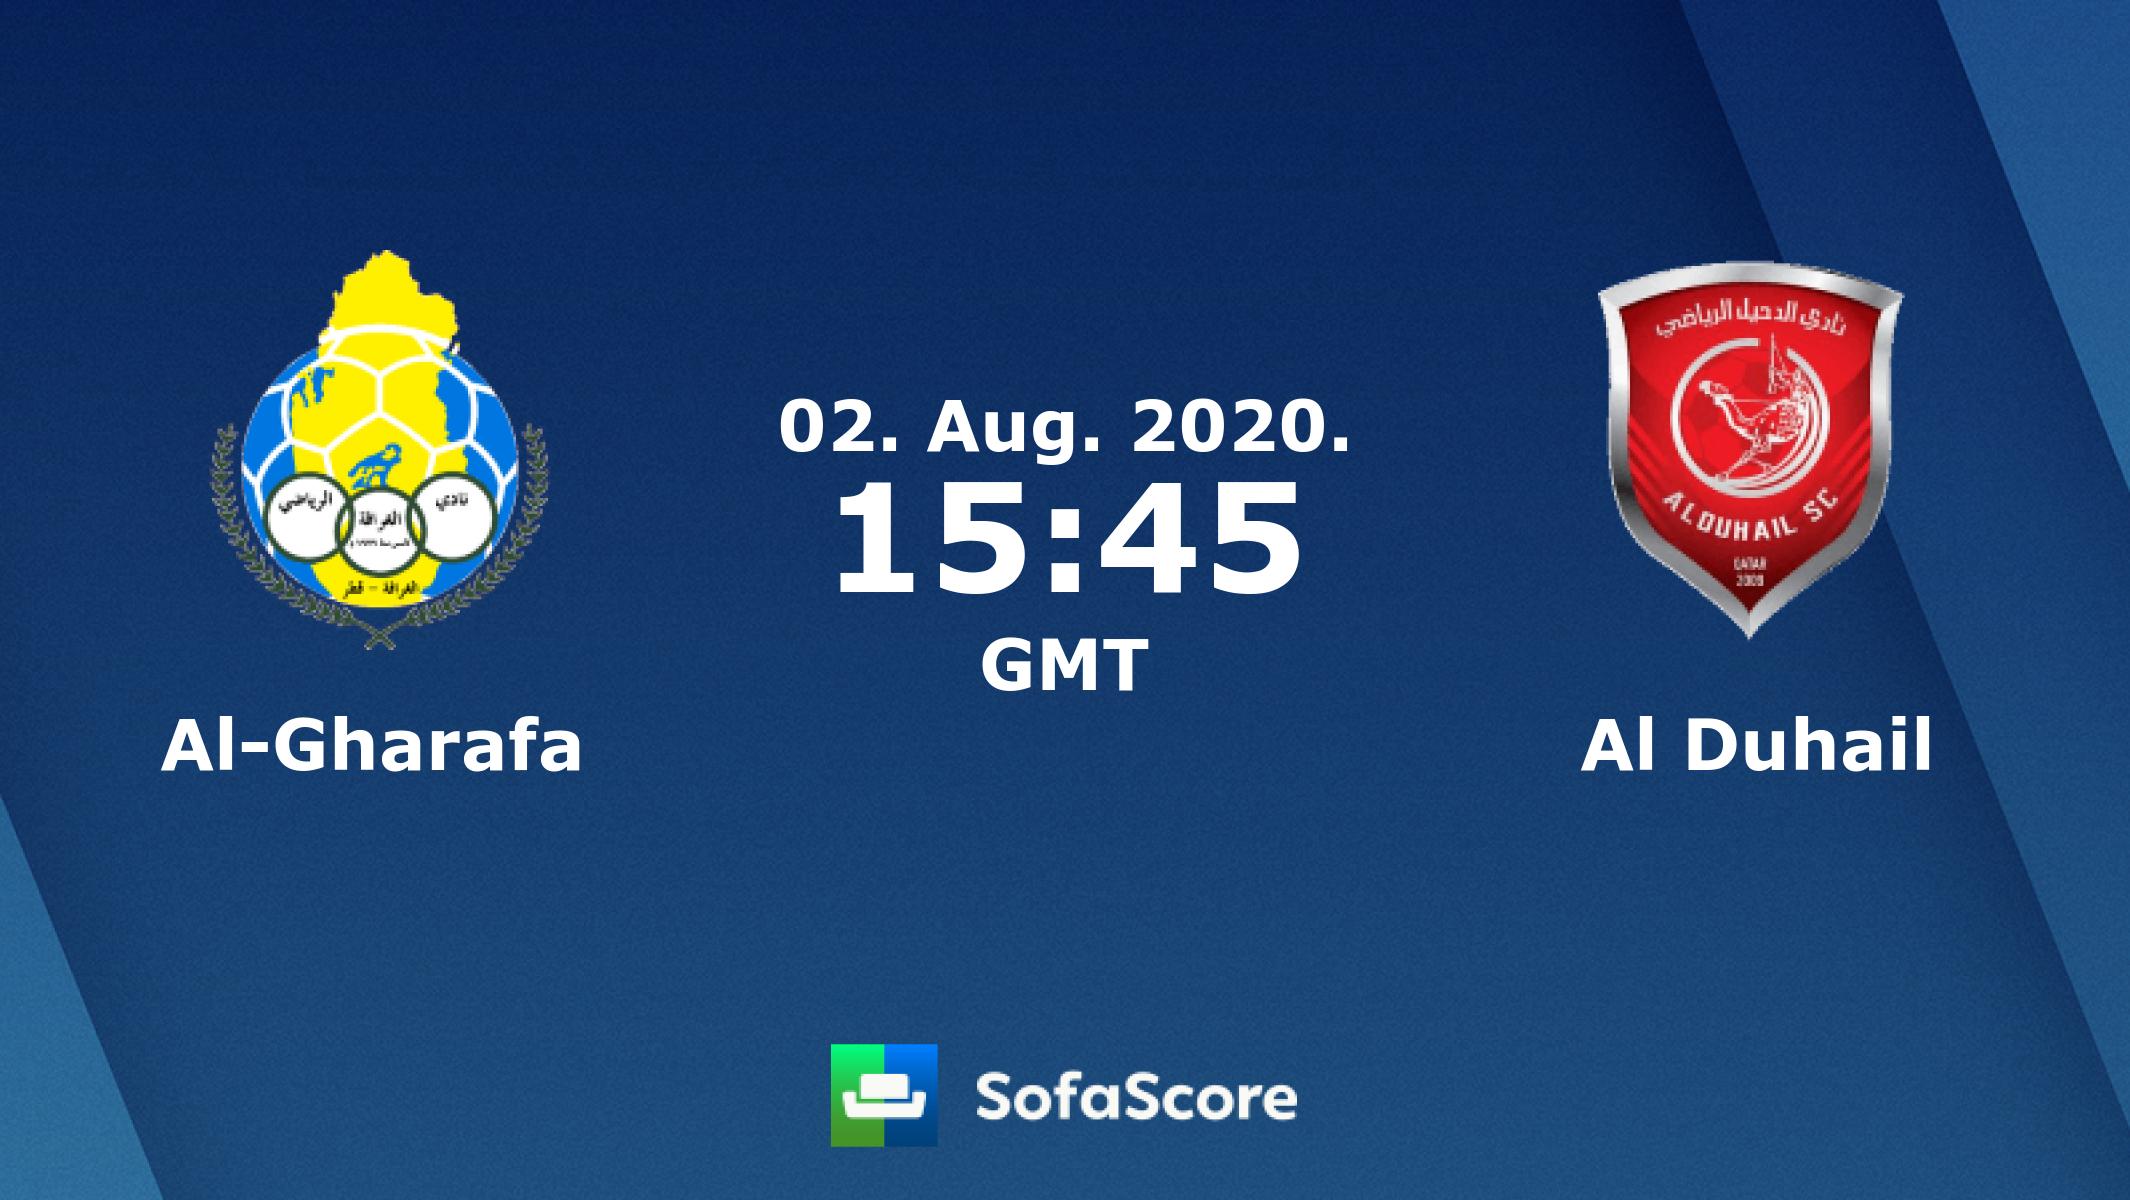 Qsl 2019/2020 результаты, футбол катар - flashscore.ru